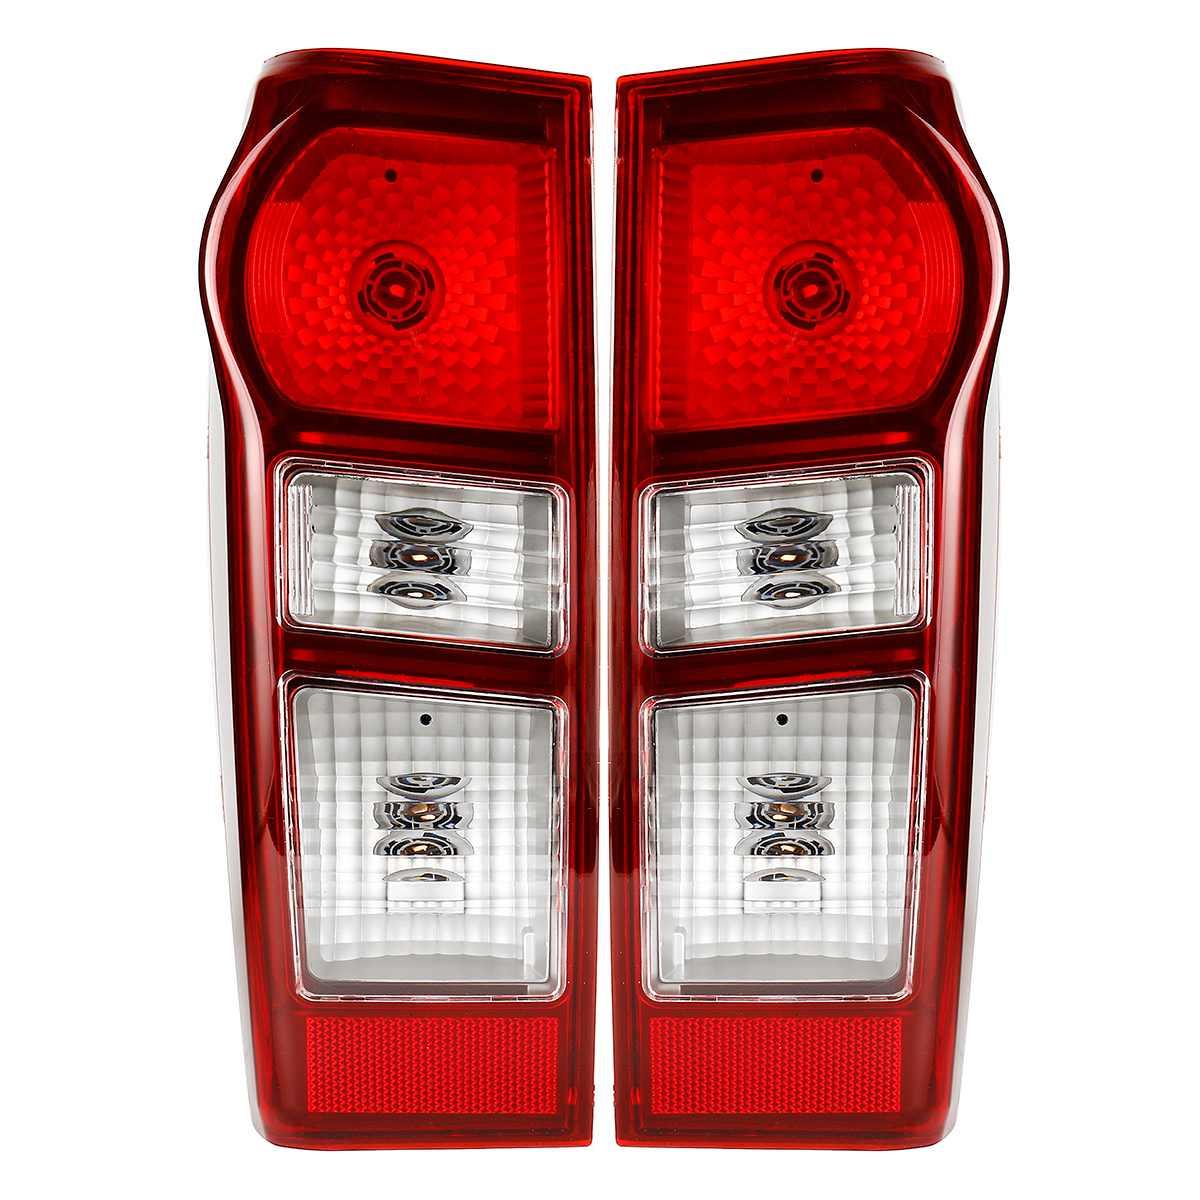 Rear Tail Light Brake Lamp Tail Light Lamp With Wire harness For Isuzu Dmax Yukon Utah 2012 2013 2014 2015 2016 2017 2018Rear Tail Light Brake Lamp Tail Light Lamp With Wire harness For Isuzu Dmax Yukon Utah 2012 2013 2014 2015 2016 2017 2018